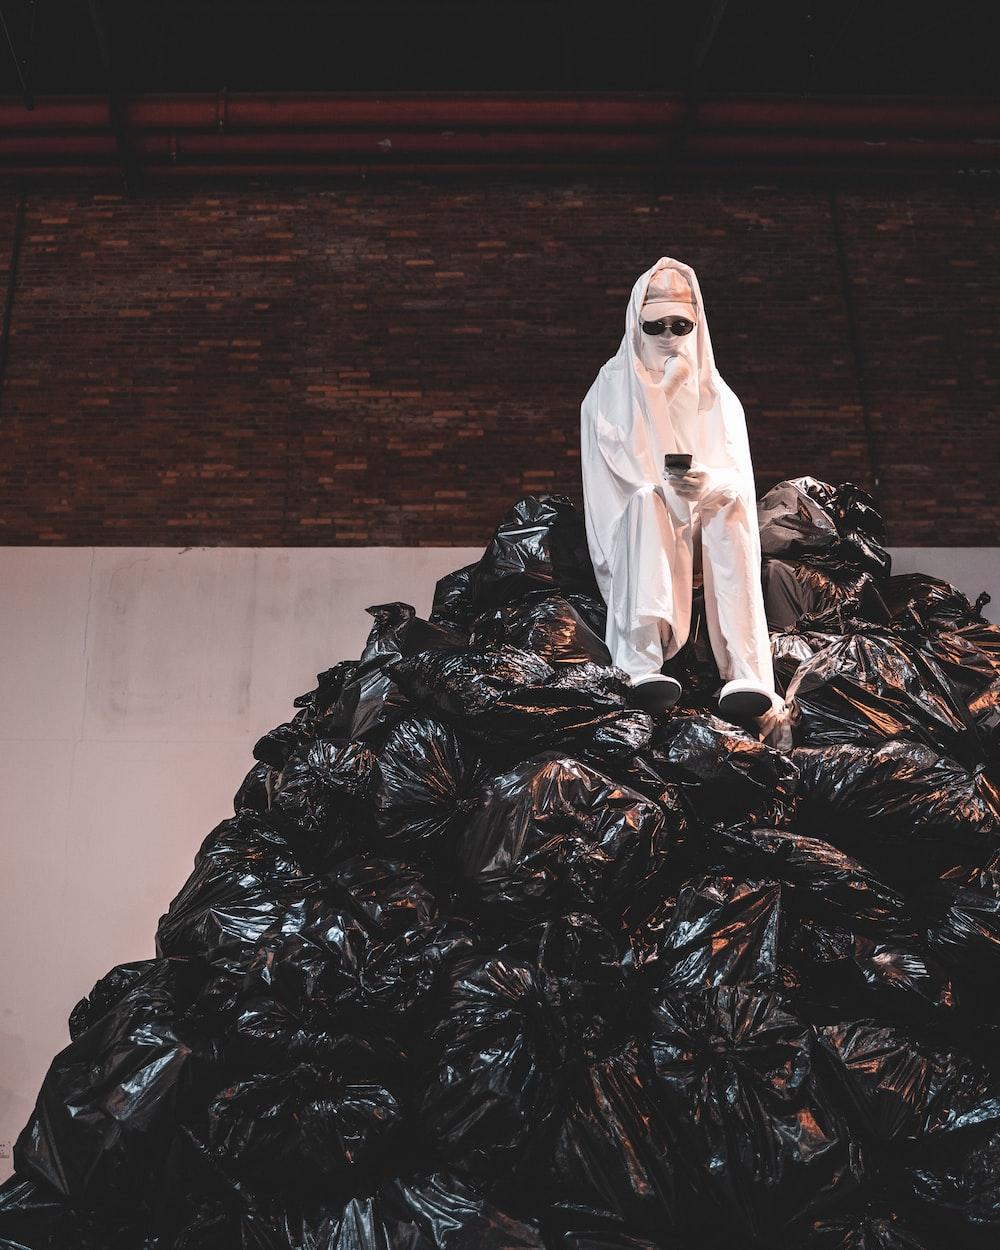 woman in white dress sitting on black plastic bag